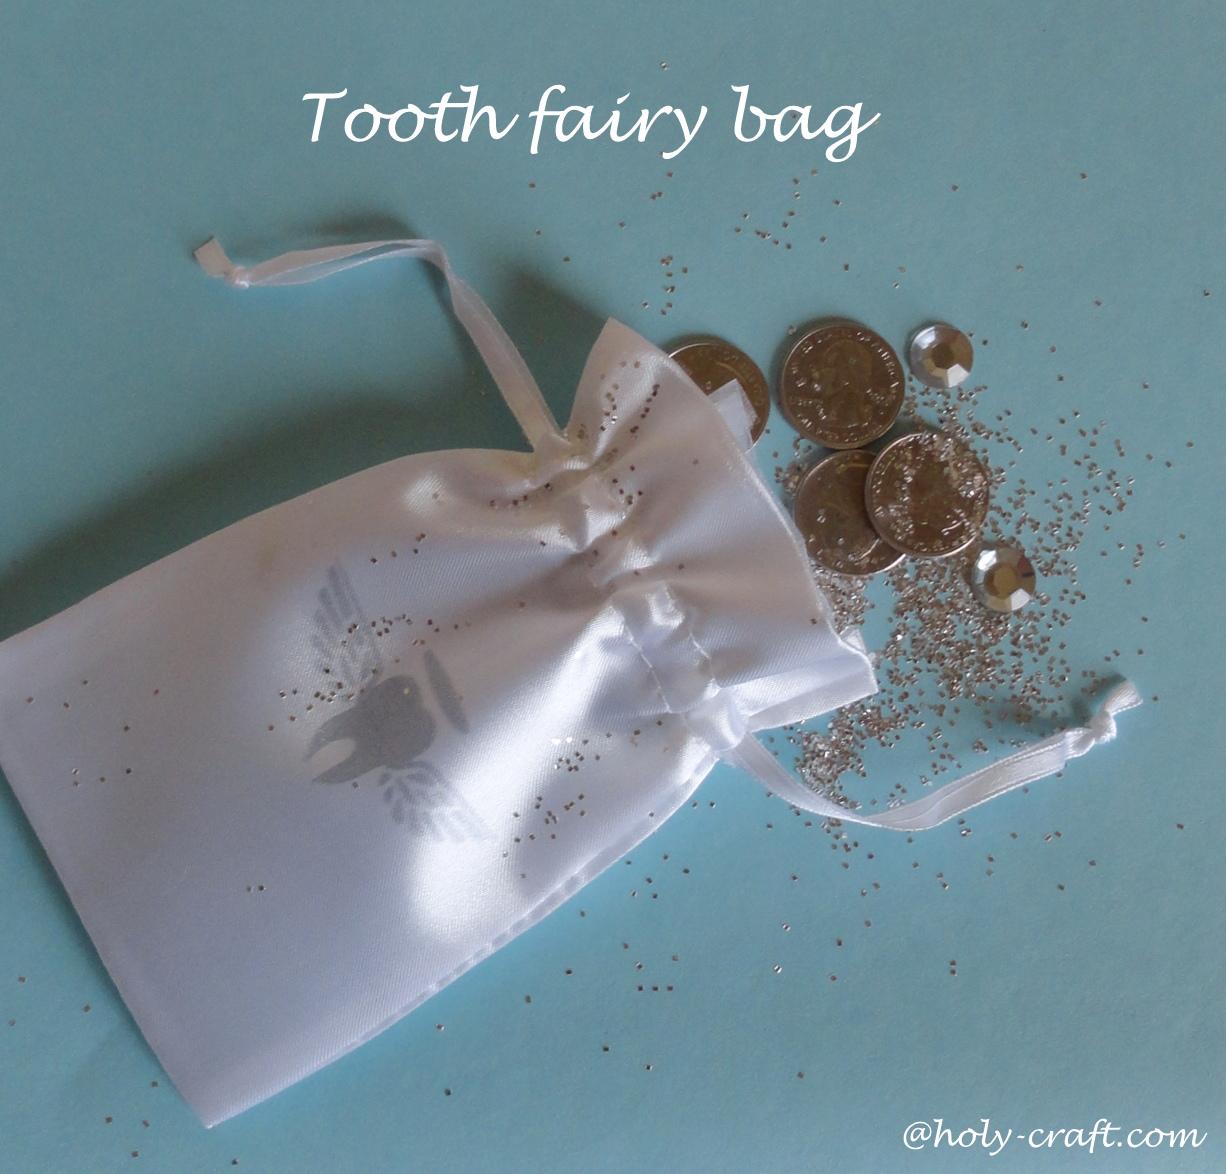 http://4.bp.blogspot.com/-fGm_oCviNXs/U4jQw82tnFI/AAAAAAAAZDQ/J2SvHt_xwvc/s1600/tooth+fairy+bag.jpg